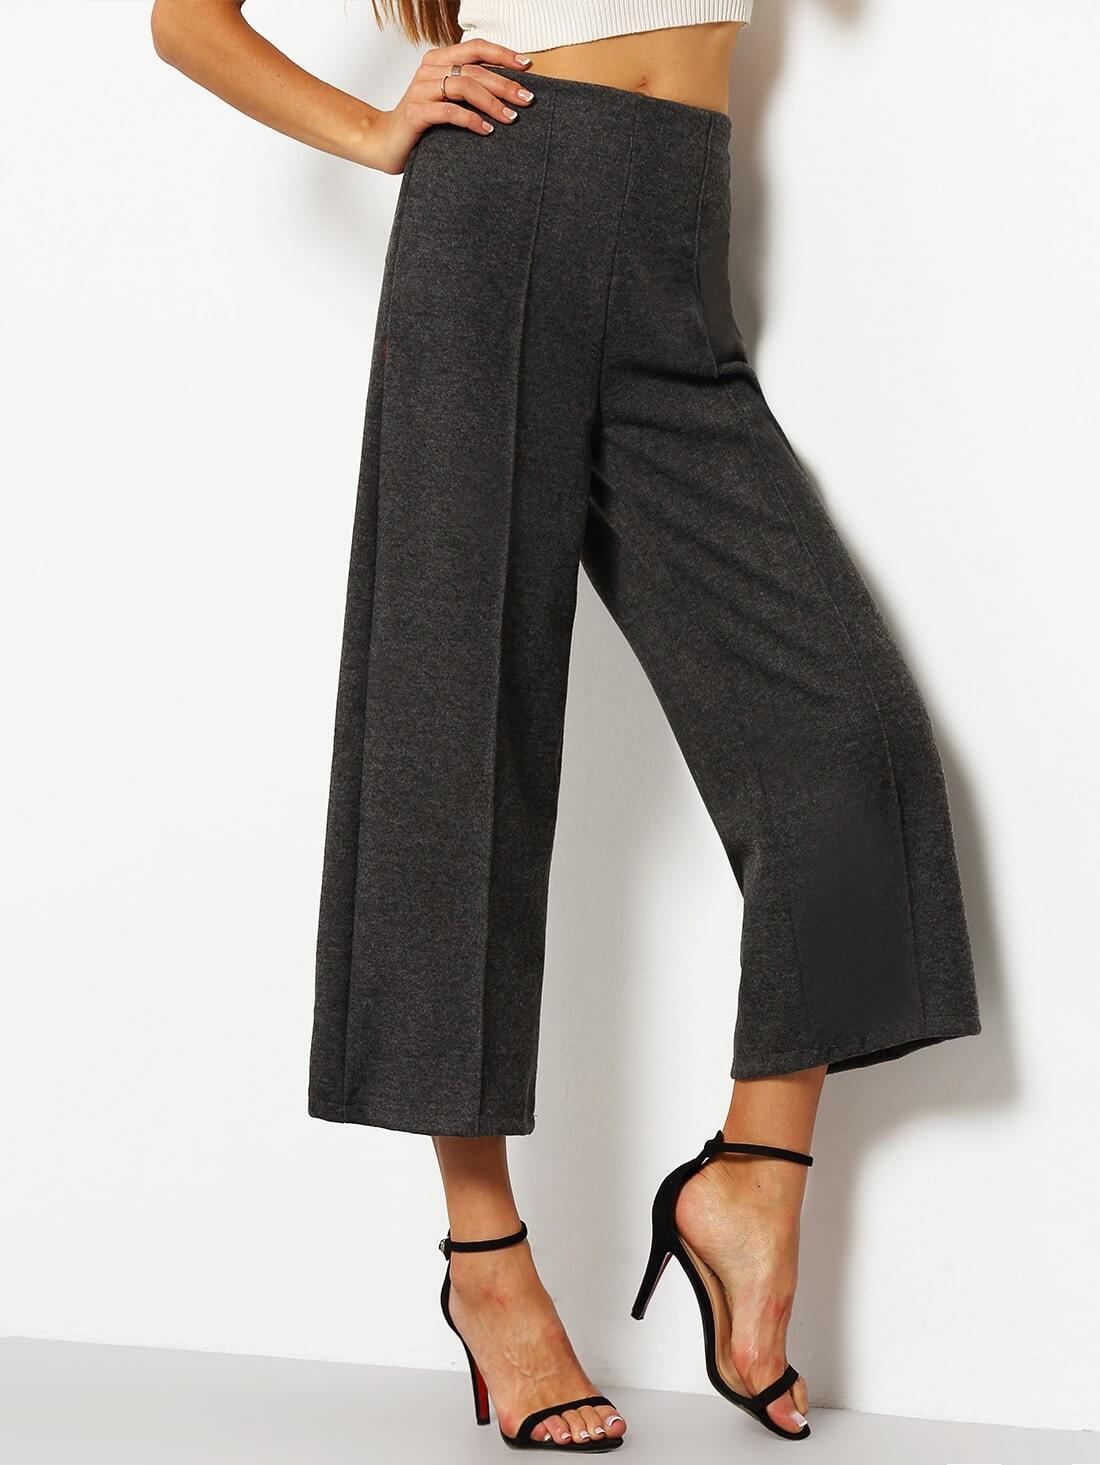 pantalon patte d 39 l phant taille haute gris french shein sheinside. Black Bedroom Furniture Sets. Home Design Ideas